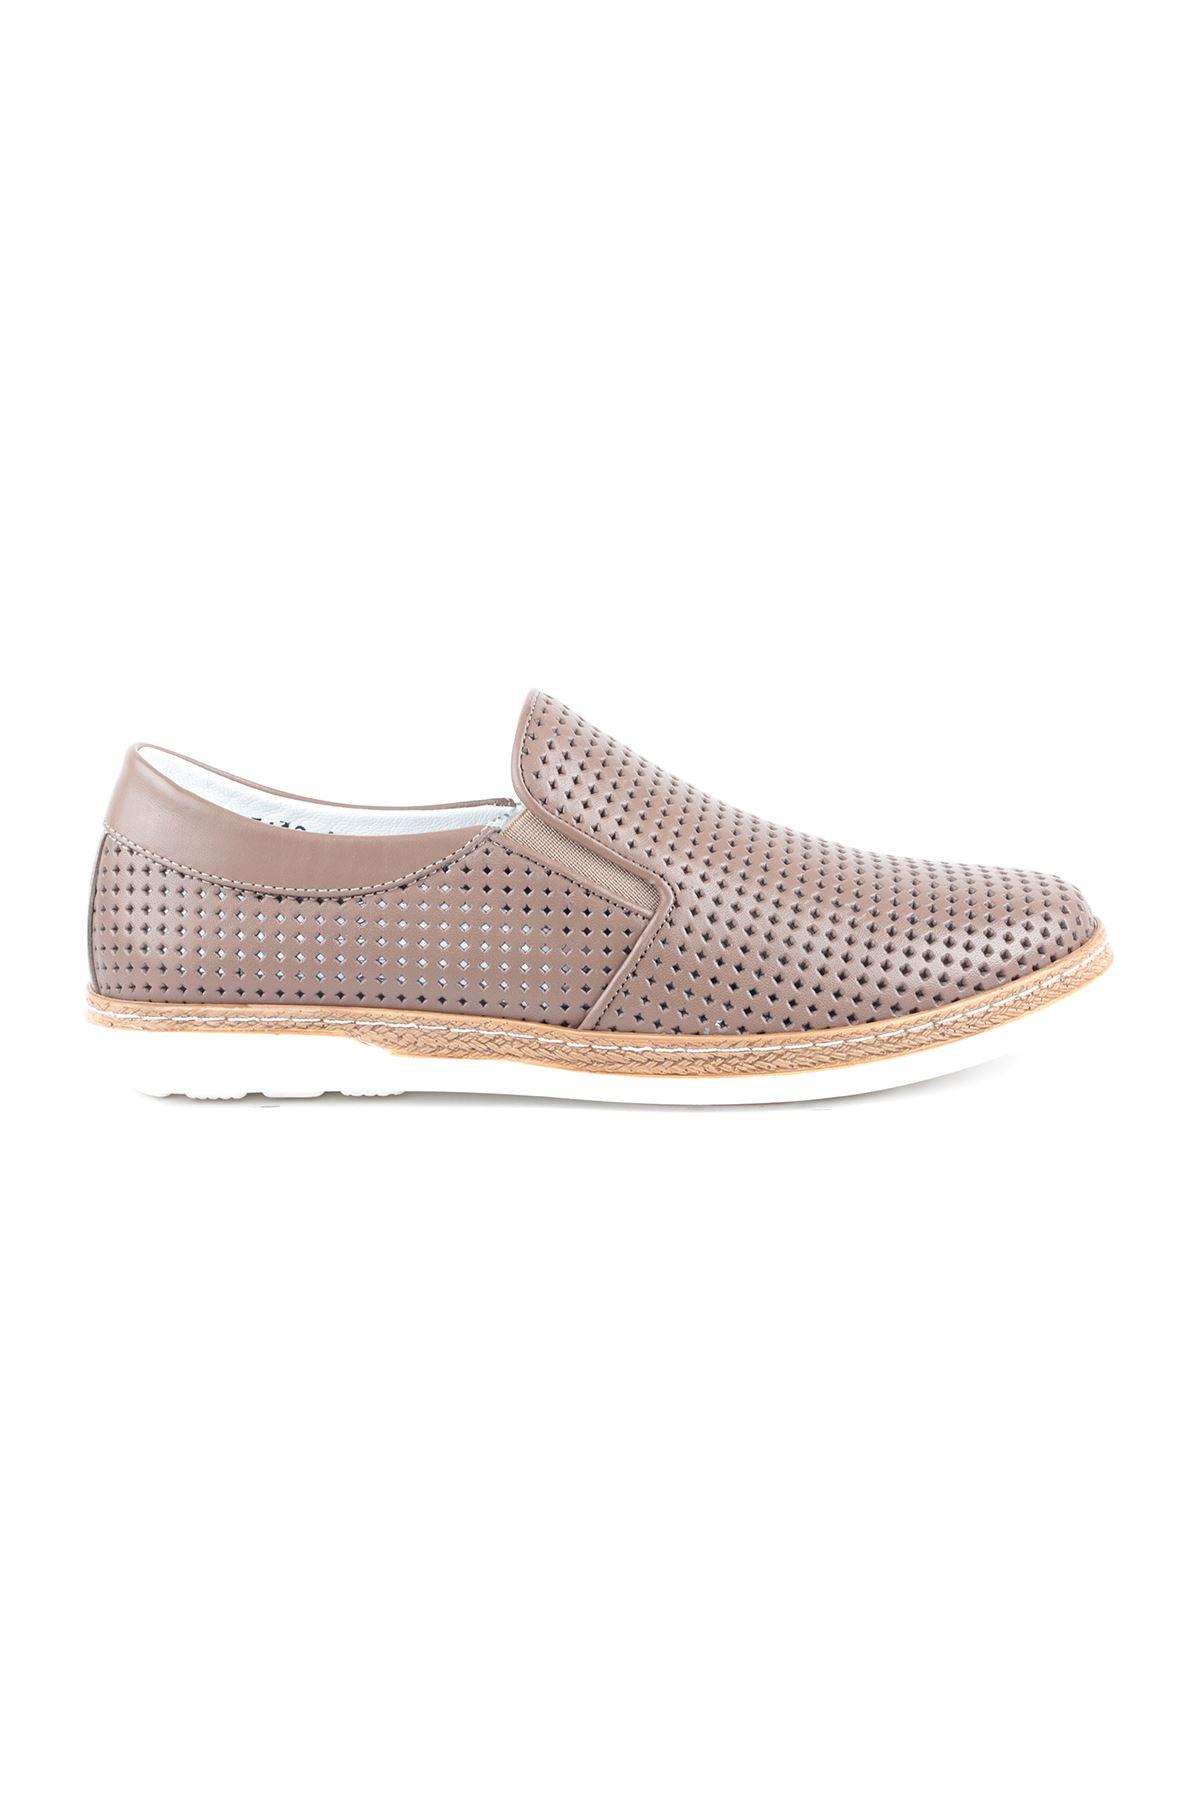 Libero L3619 Mink Loafer Men's Shoes